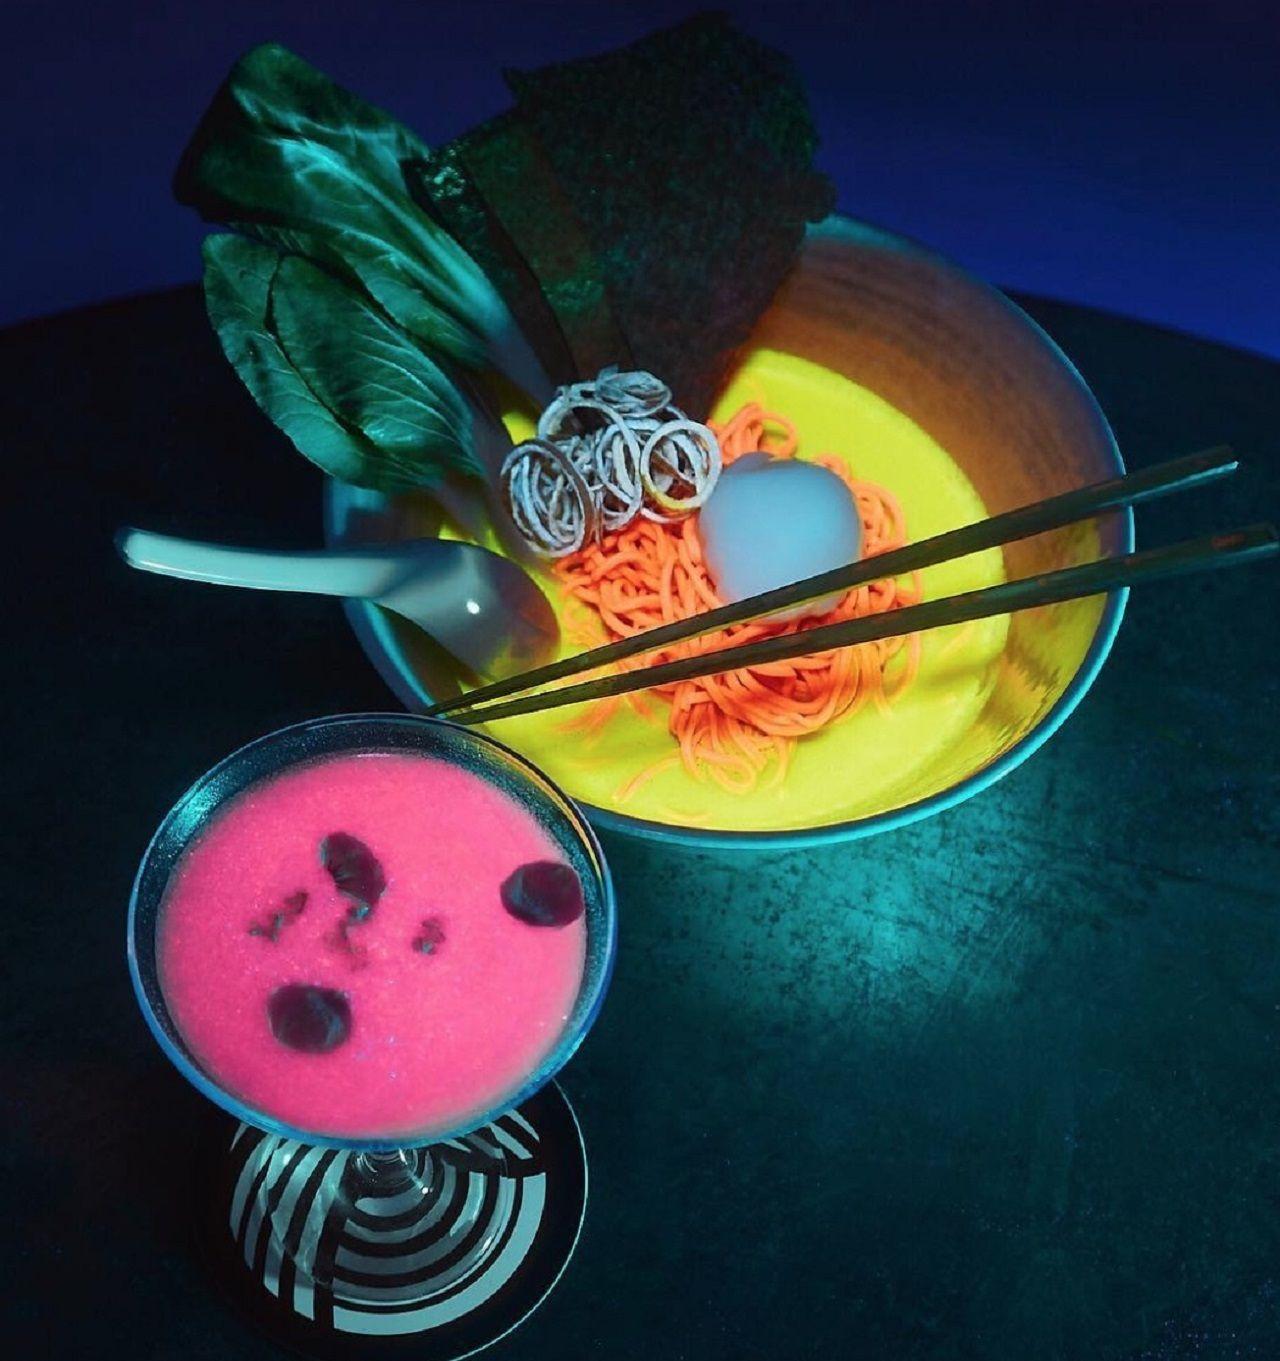 Glow-in-the-dark ramen shop